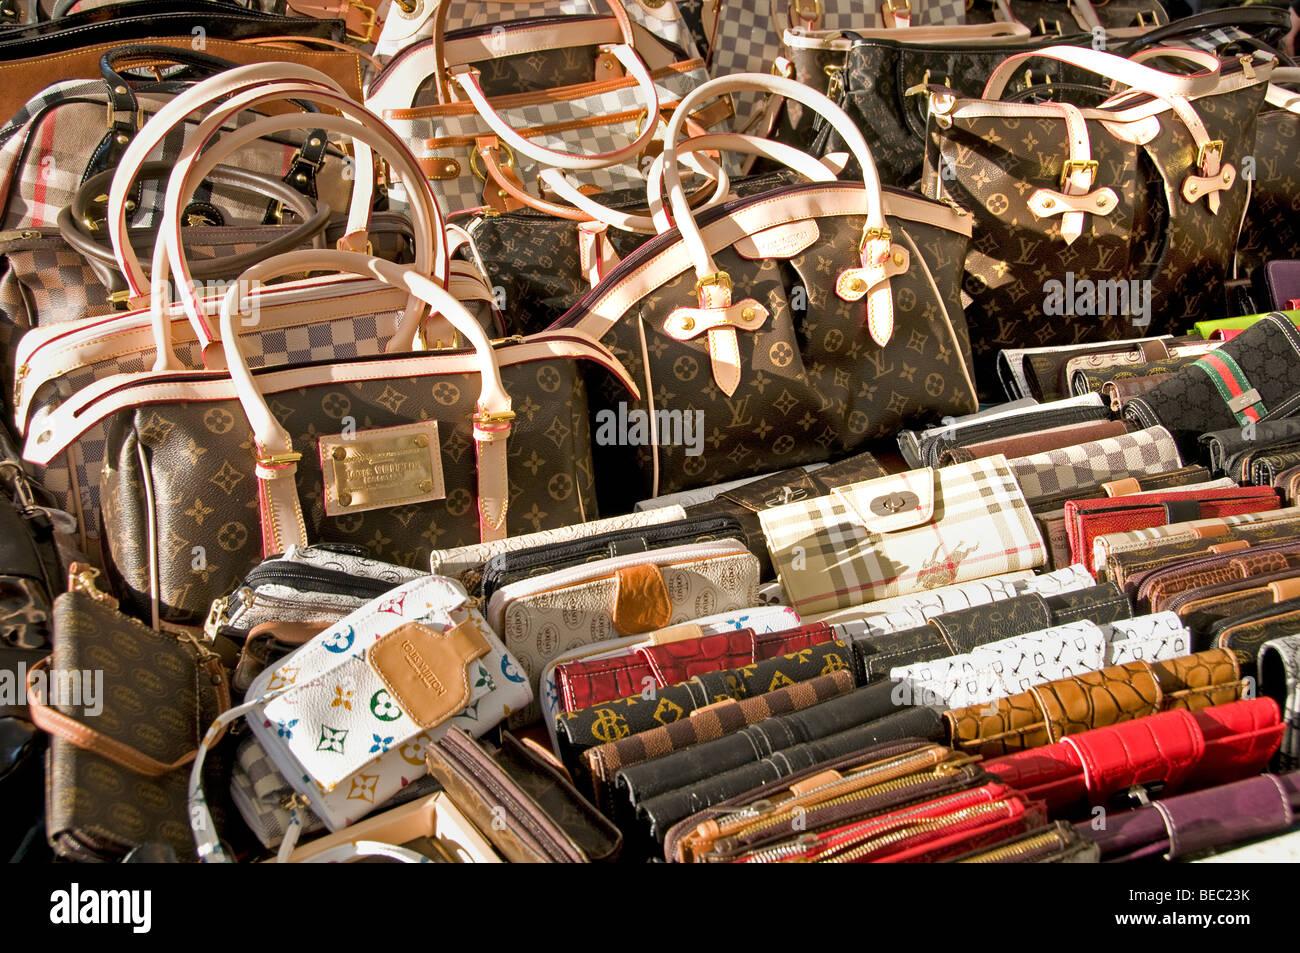 Istanbul Turkey imitation bag bags Louis Vuitton - Stock Image